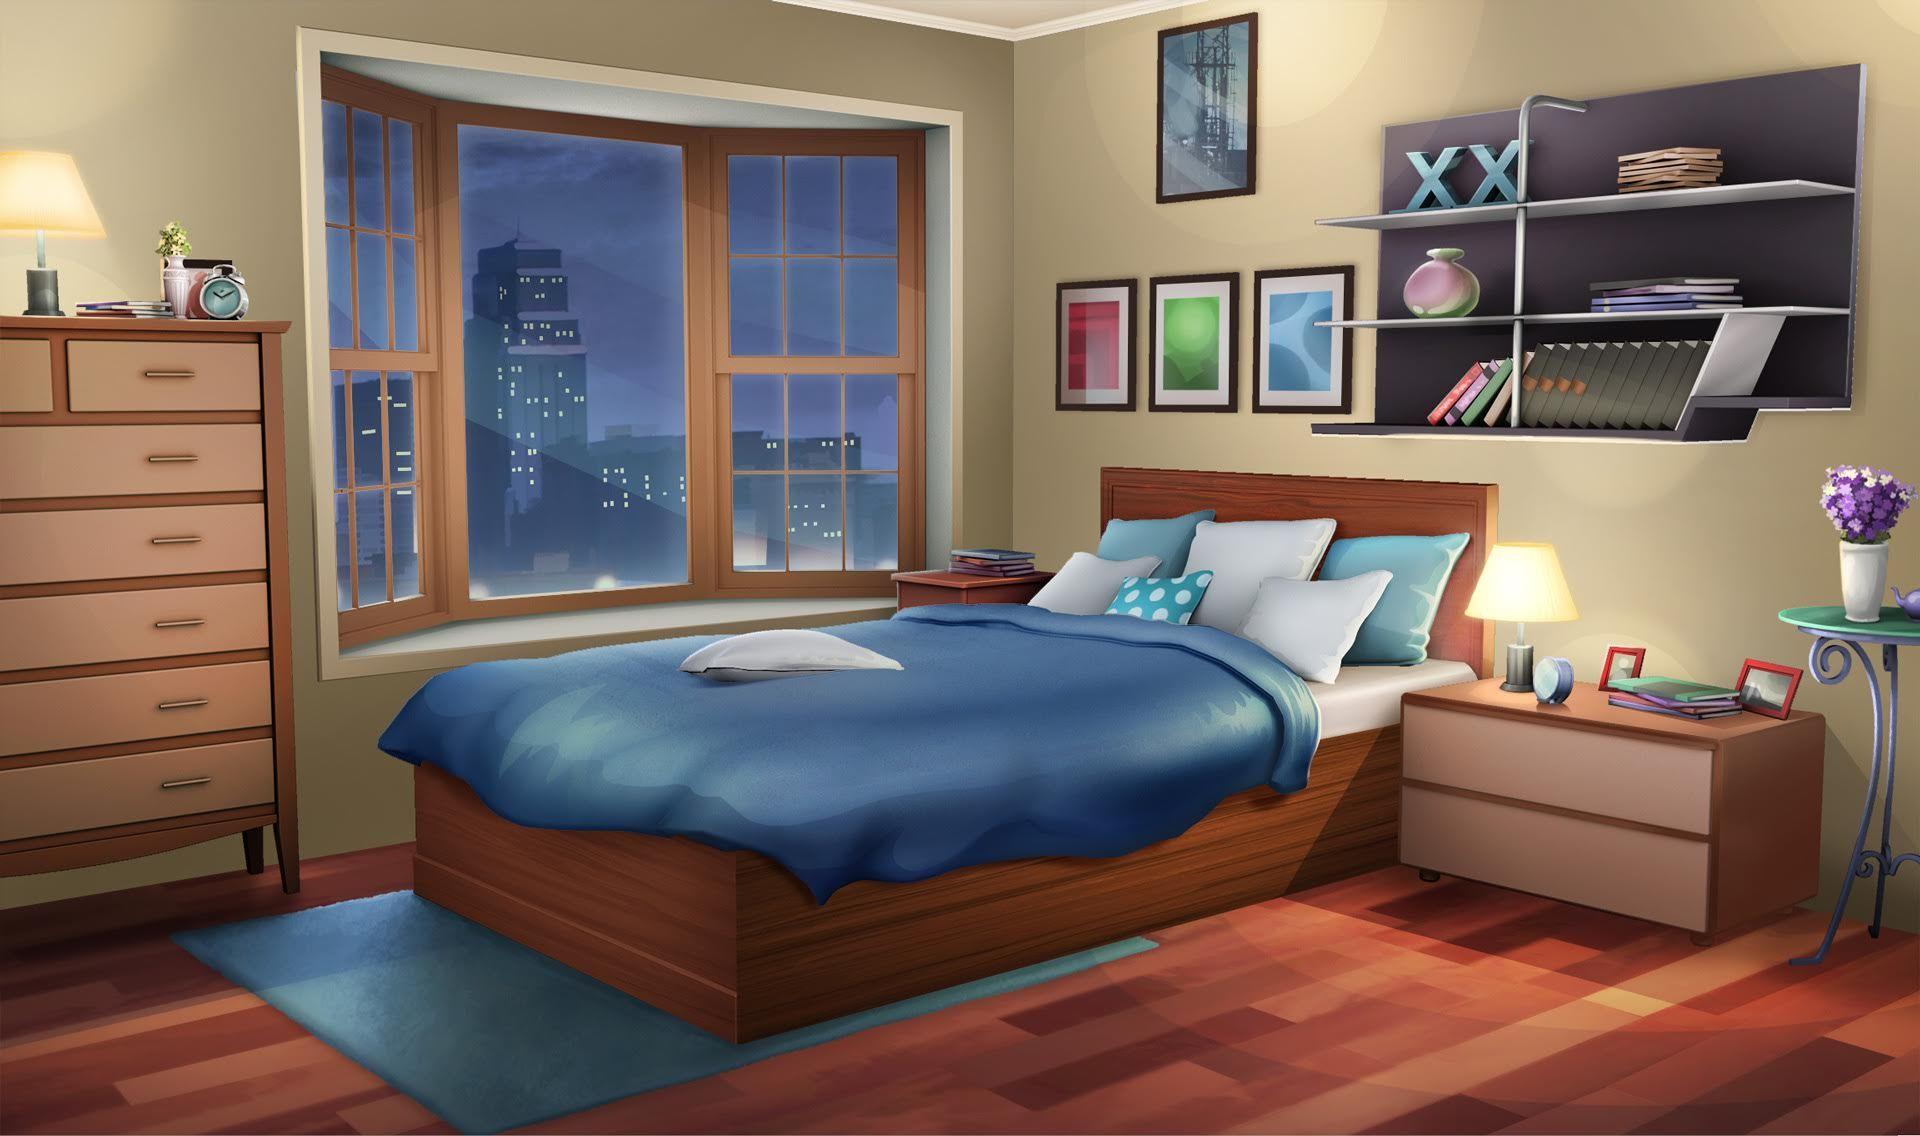 Int Fancy Apartment Bedroom Night Decoracao De Quarto Tumblr